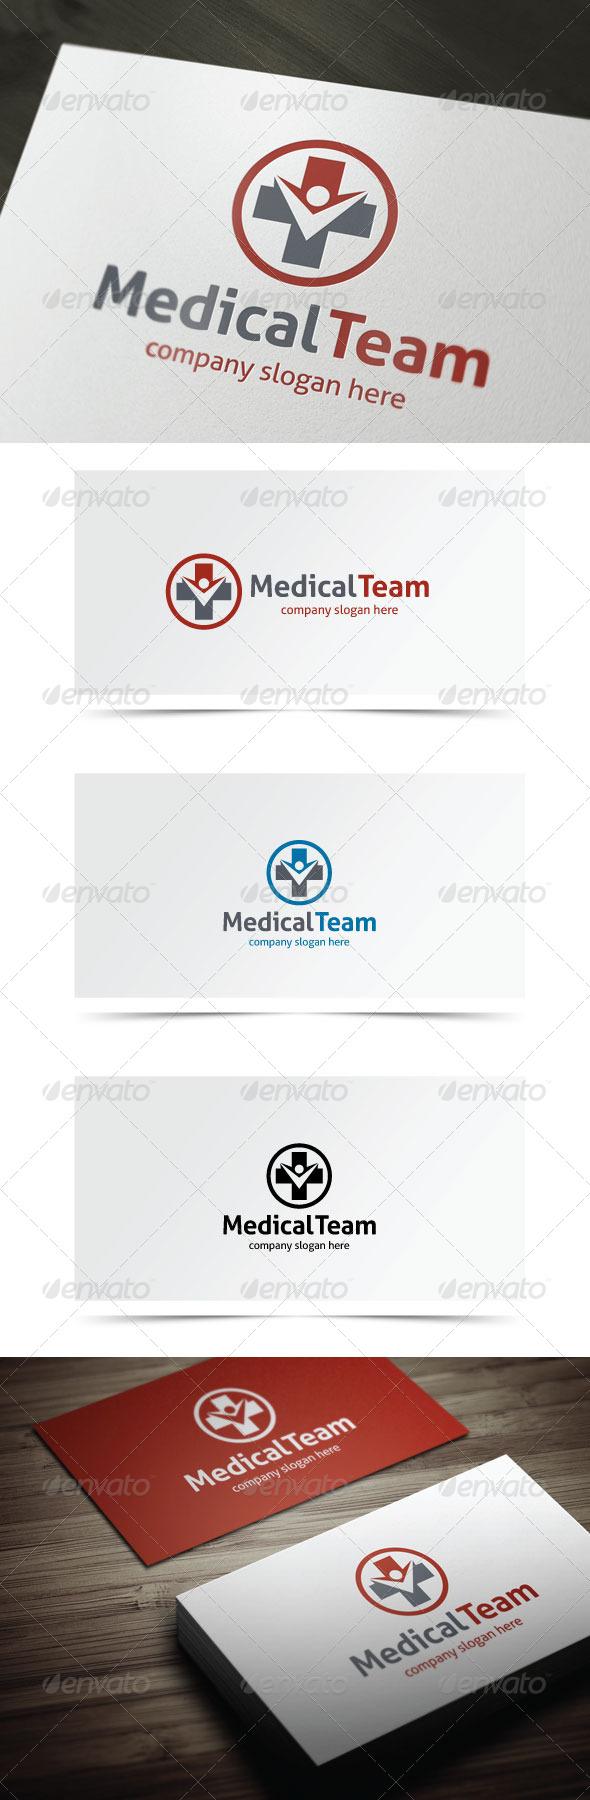 GraphicRiver Medical Team 7228410